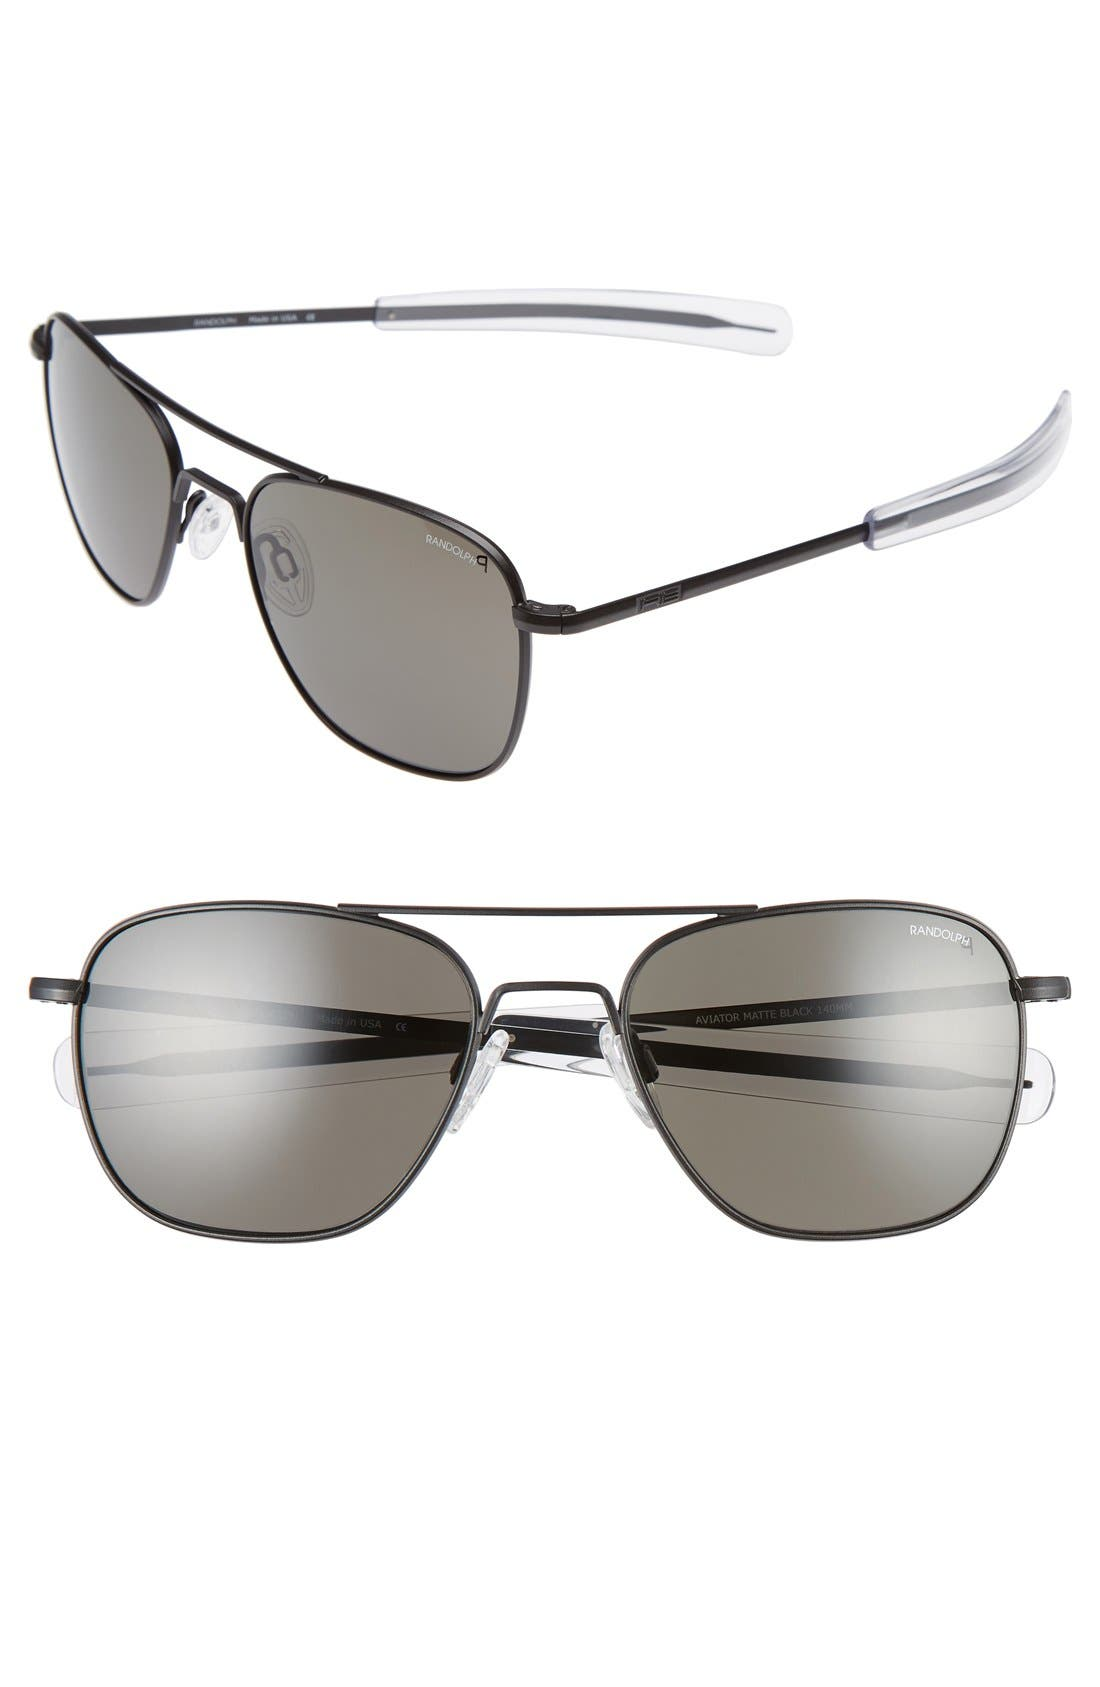 55mm Polarized Aviator Sunglasses,                         Main,                         color, Matte Black